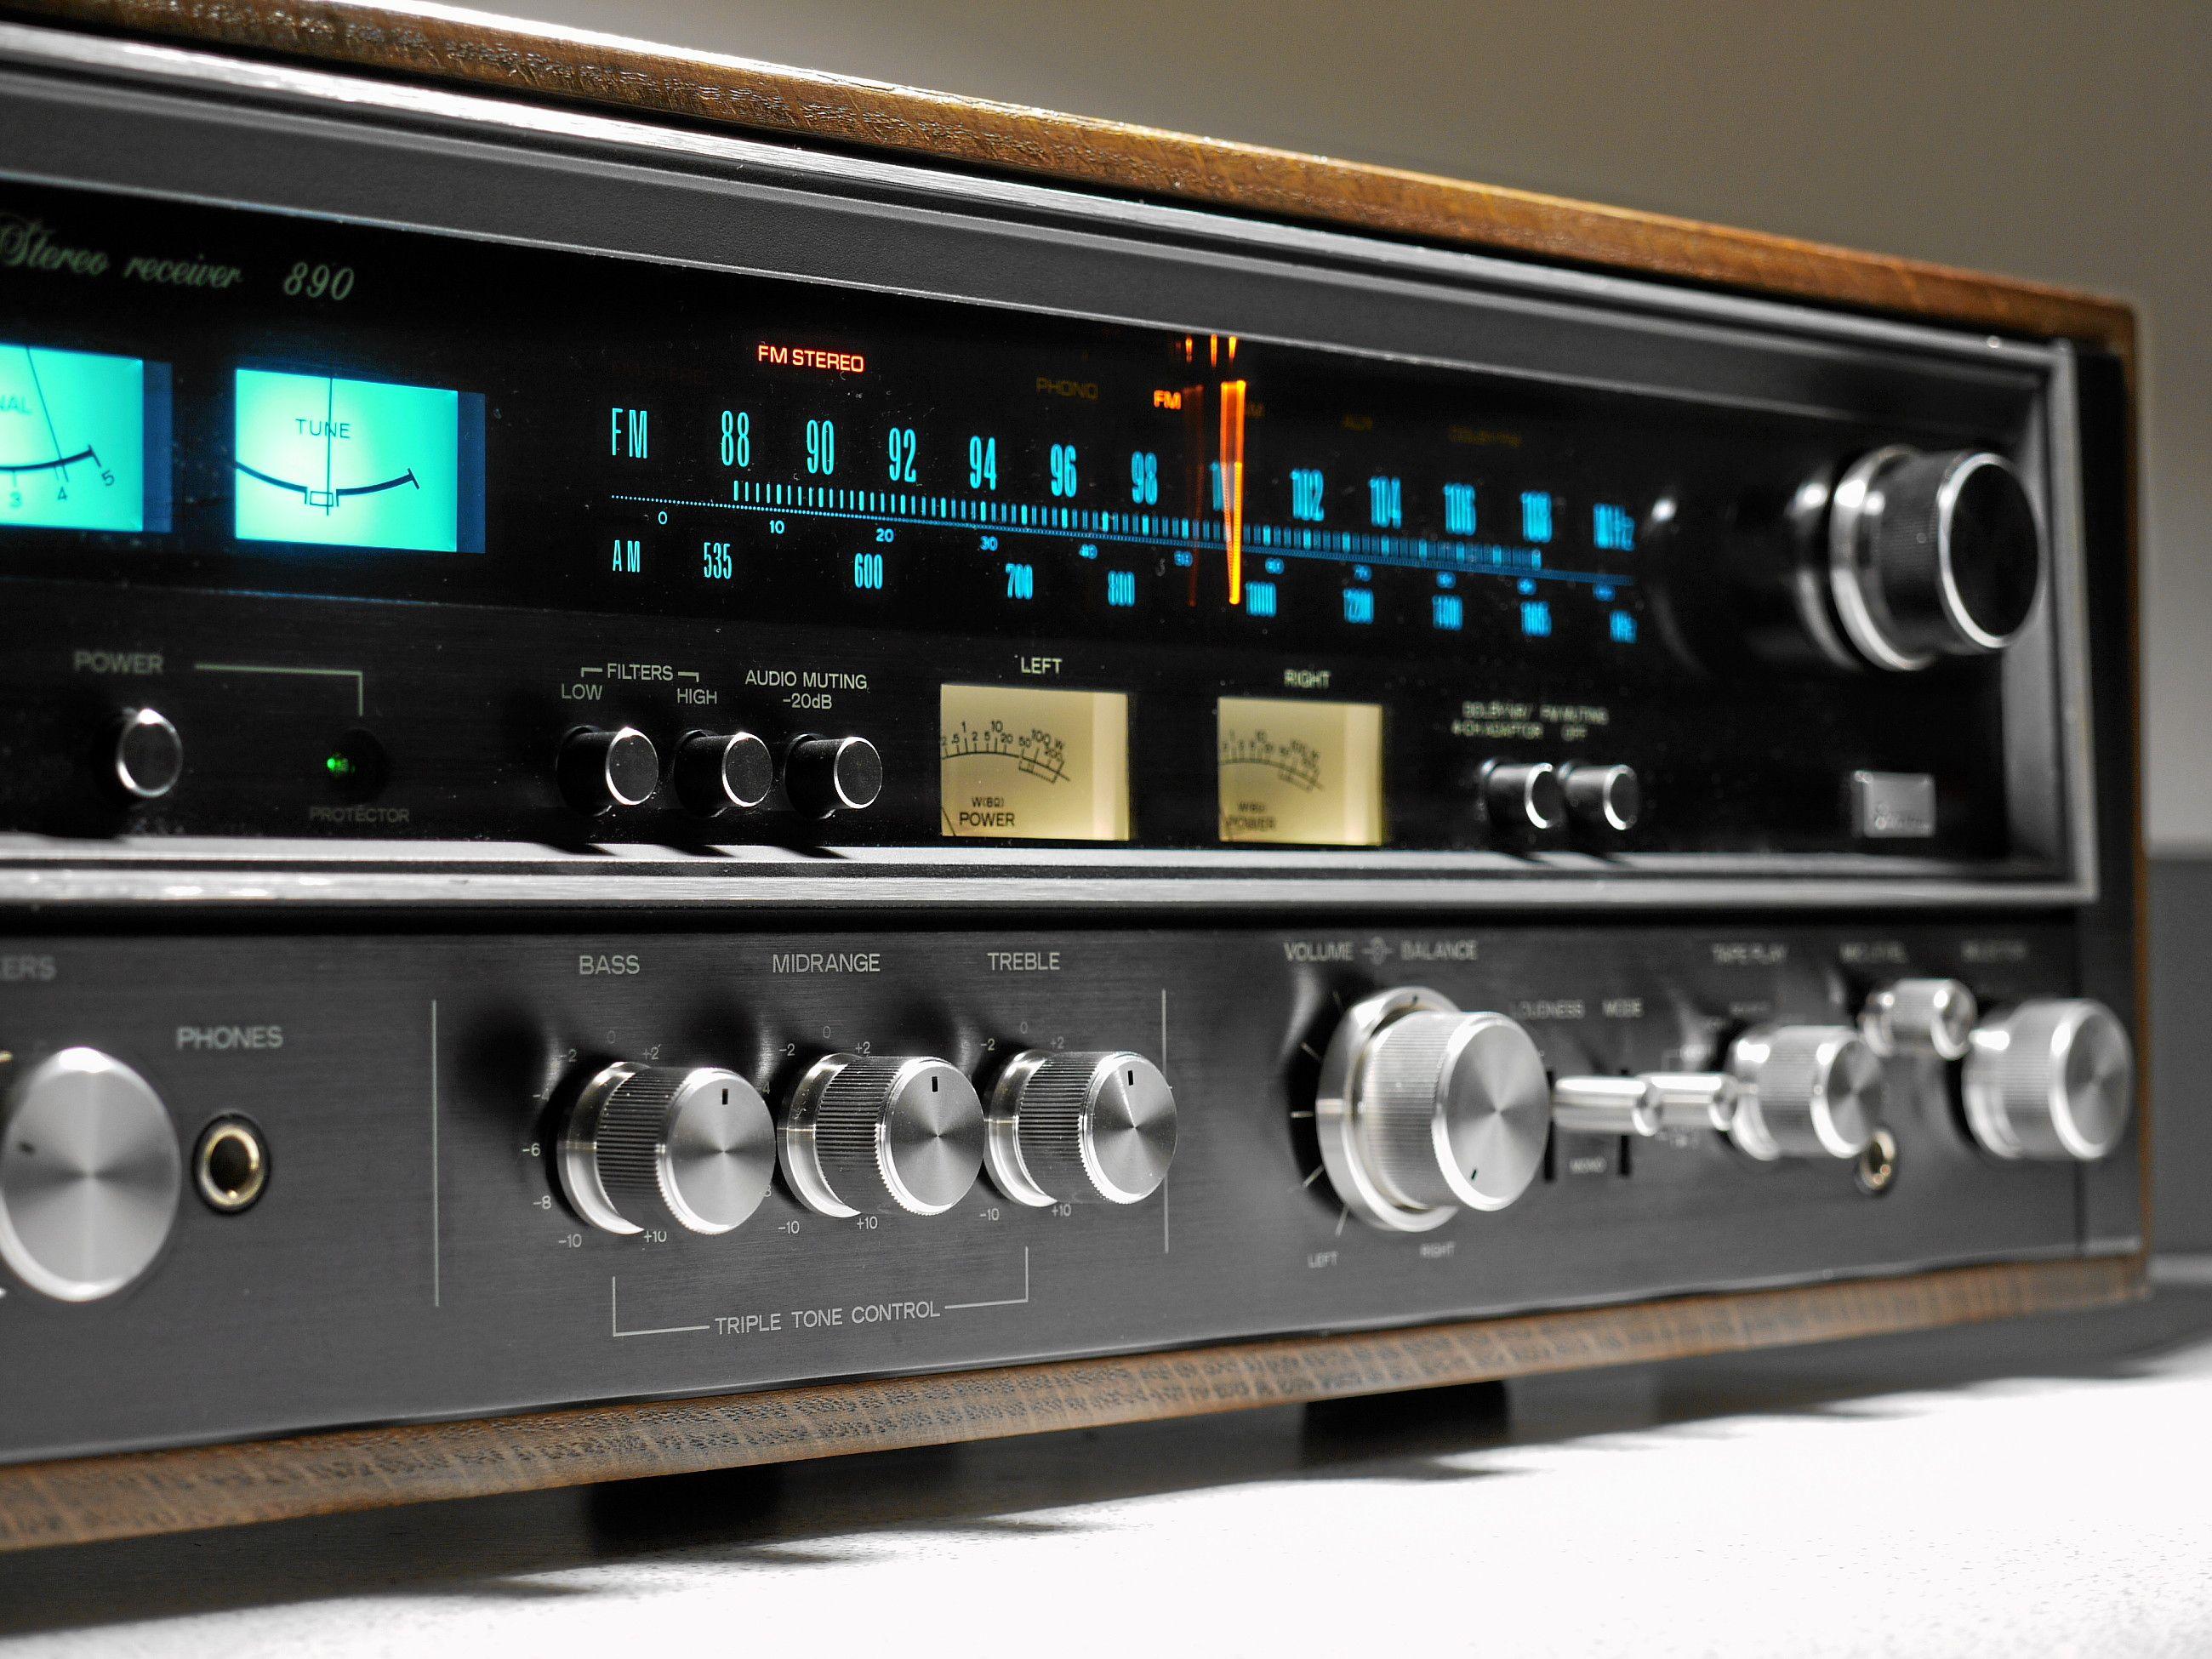 Sansui 890 Stereo Receiver Audiophile Turntable Vintage Electronics Hifi